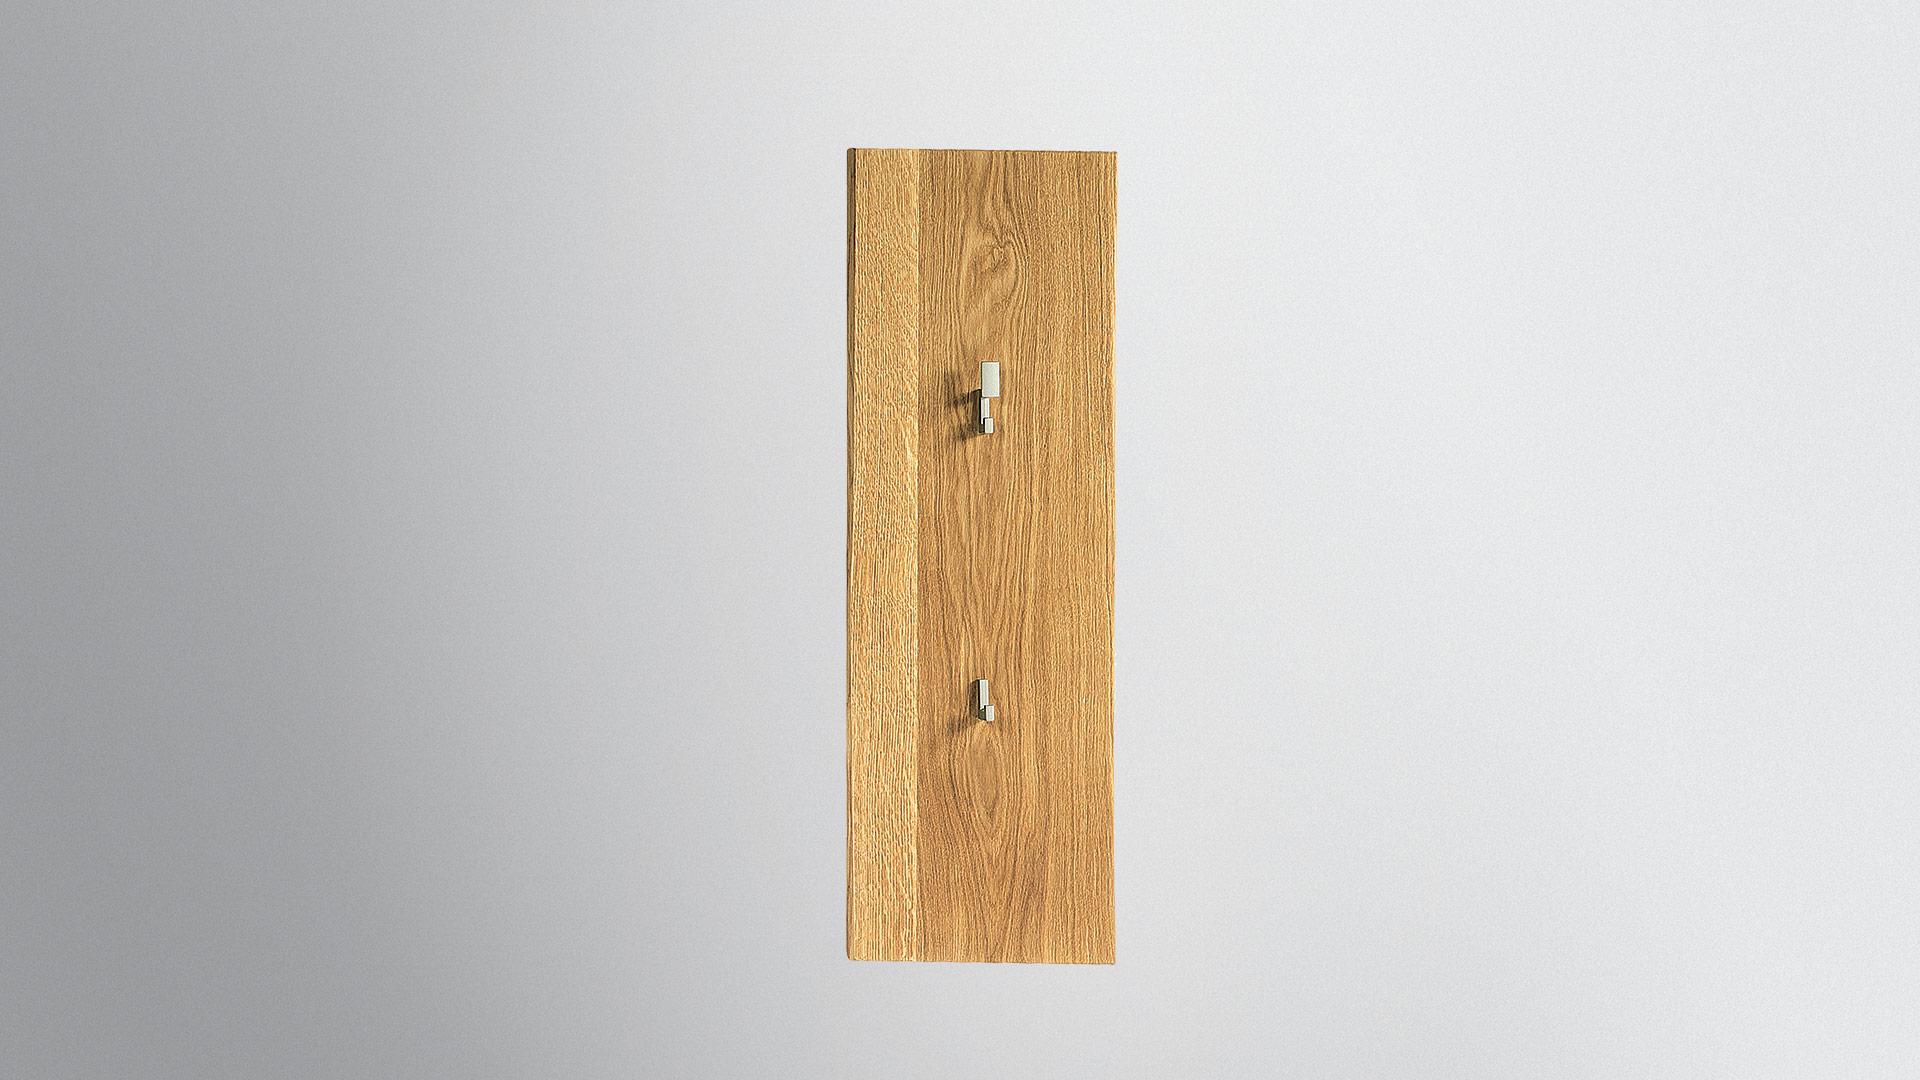 Klein garderobe loca for Garderobenpaneel holz